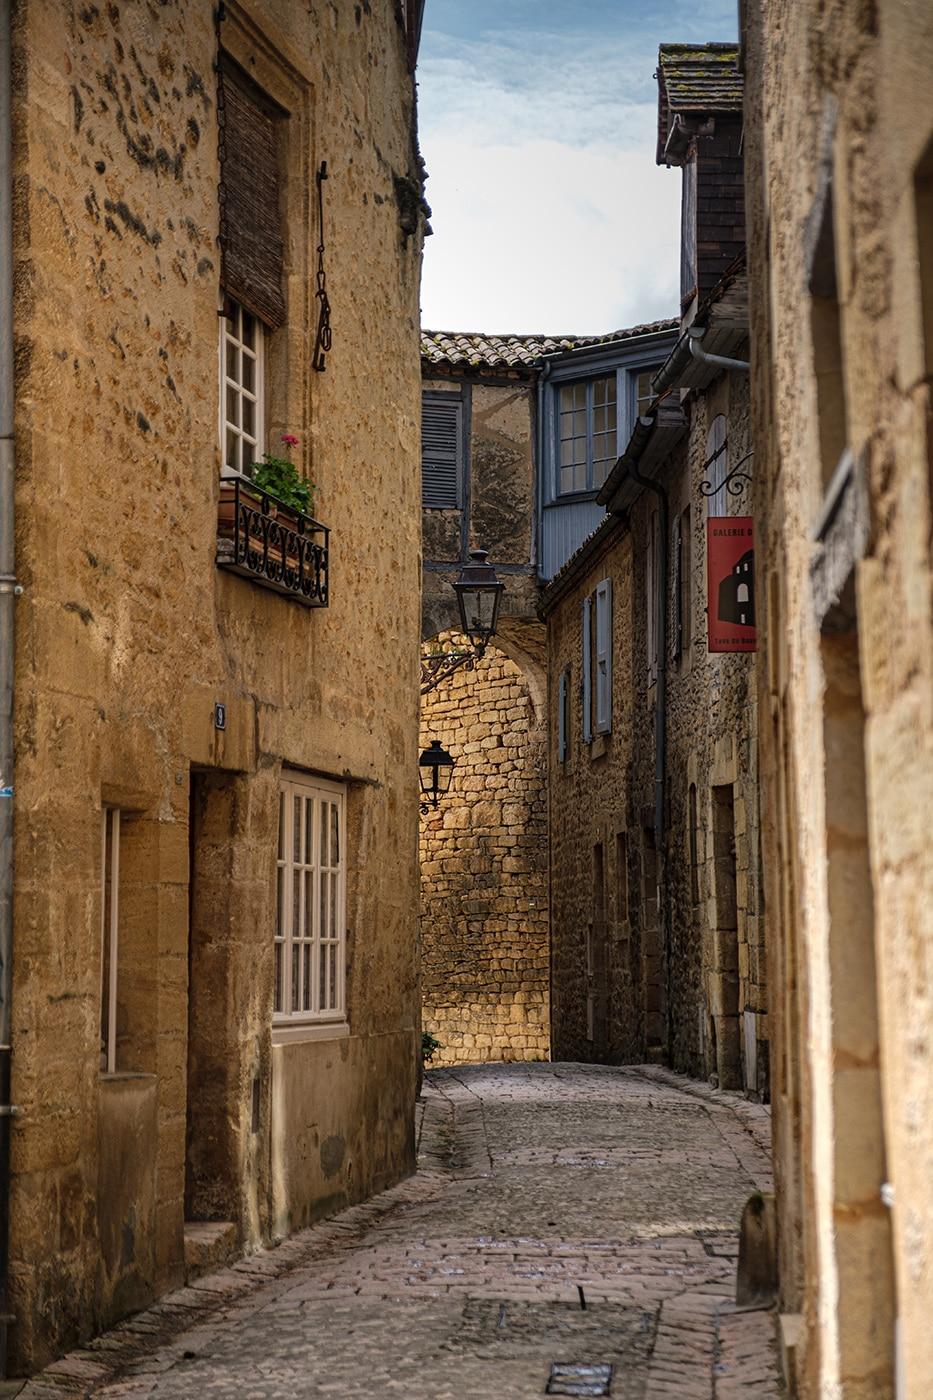 Ruelle de Sarlat-la-Canéda